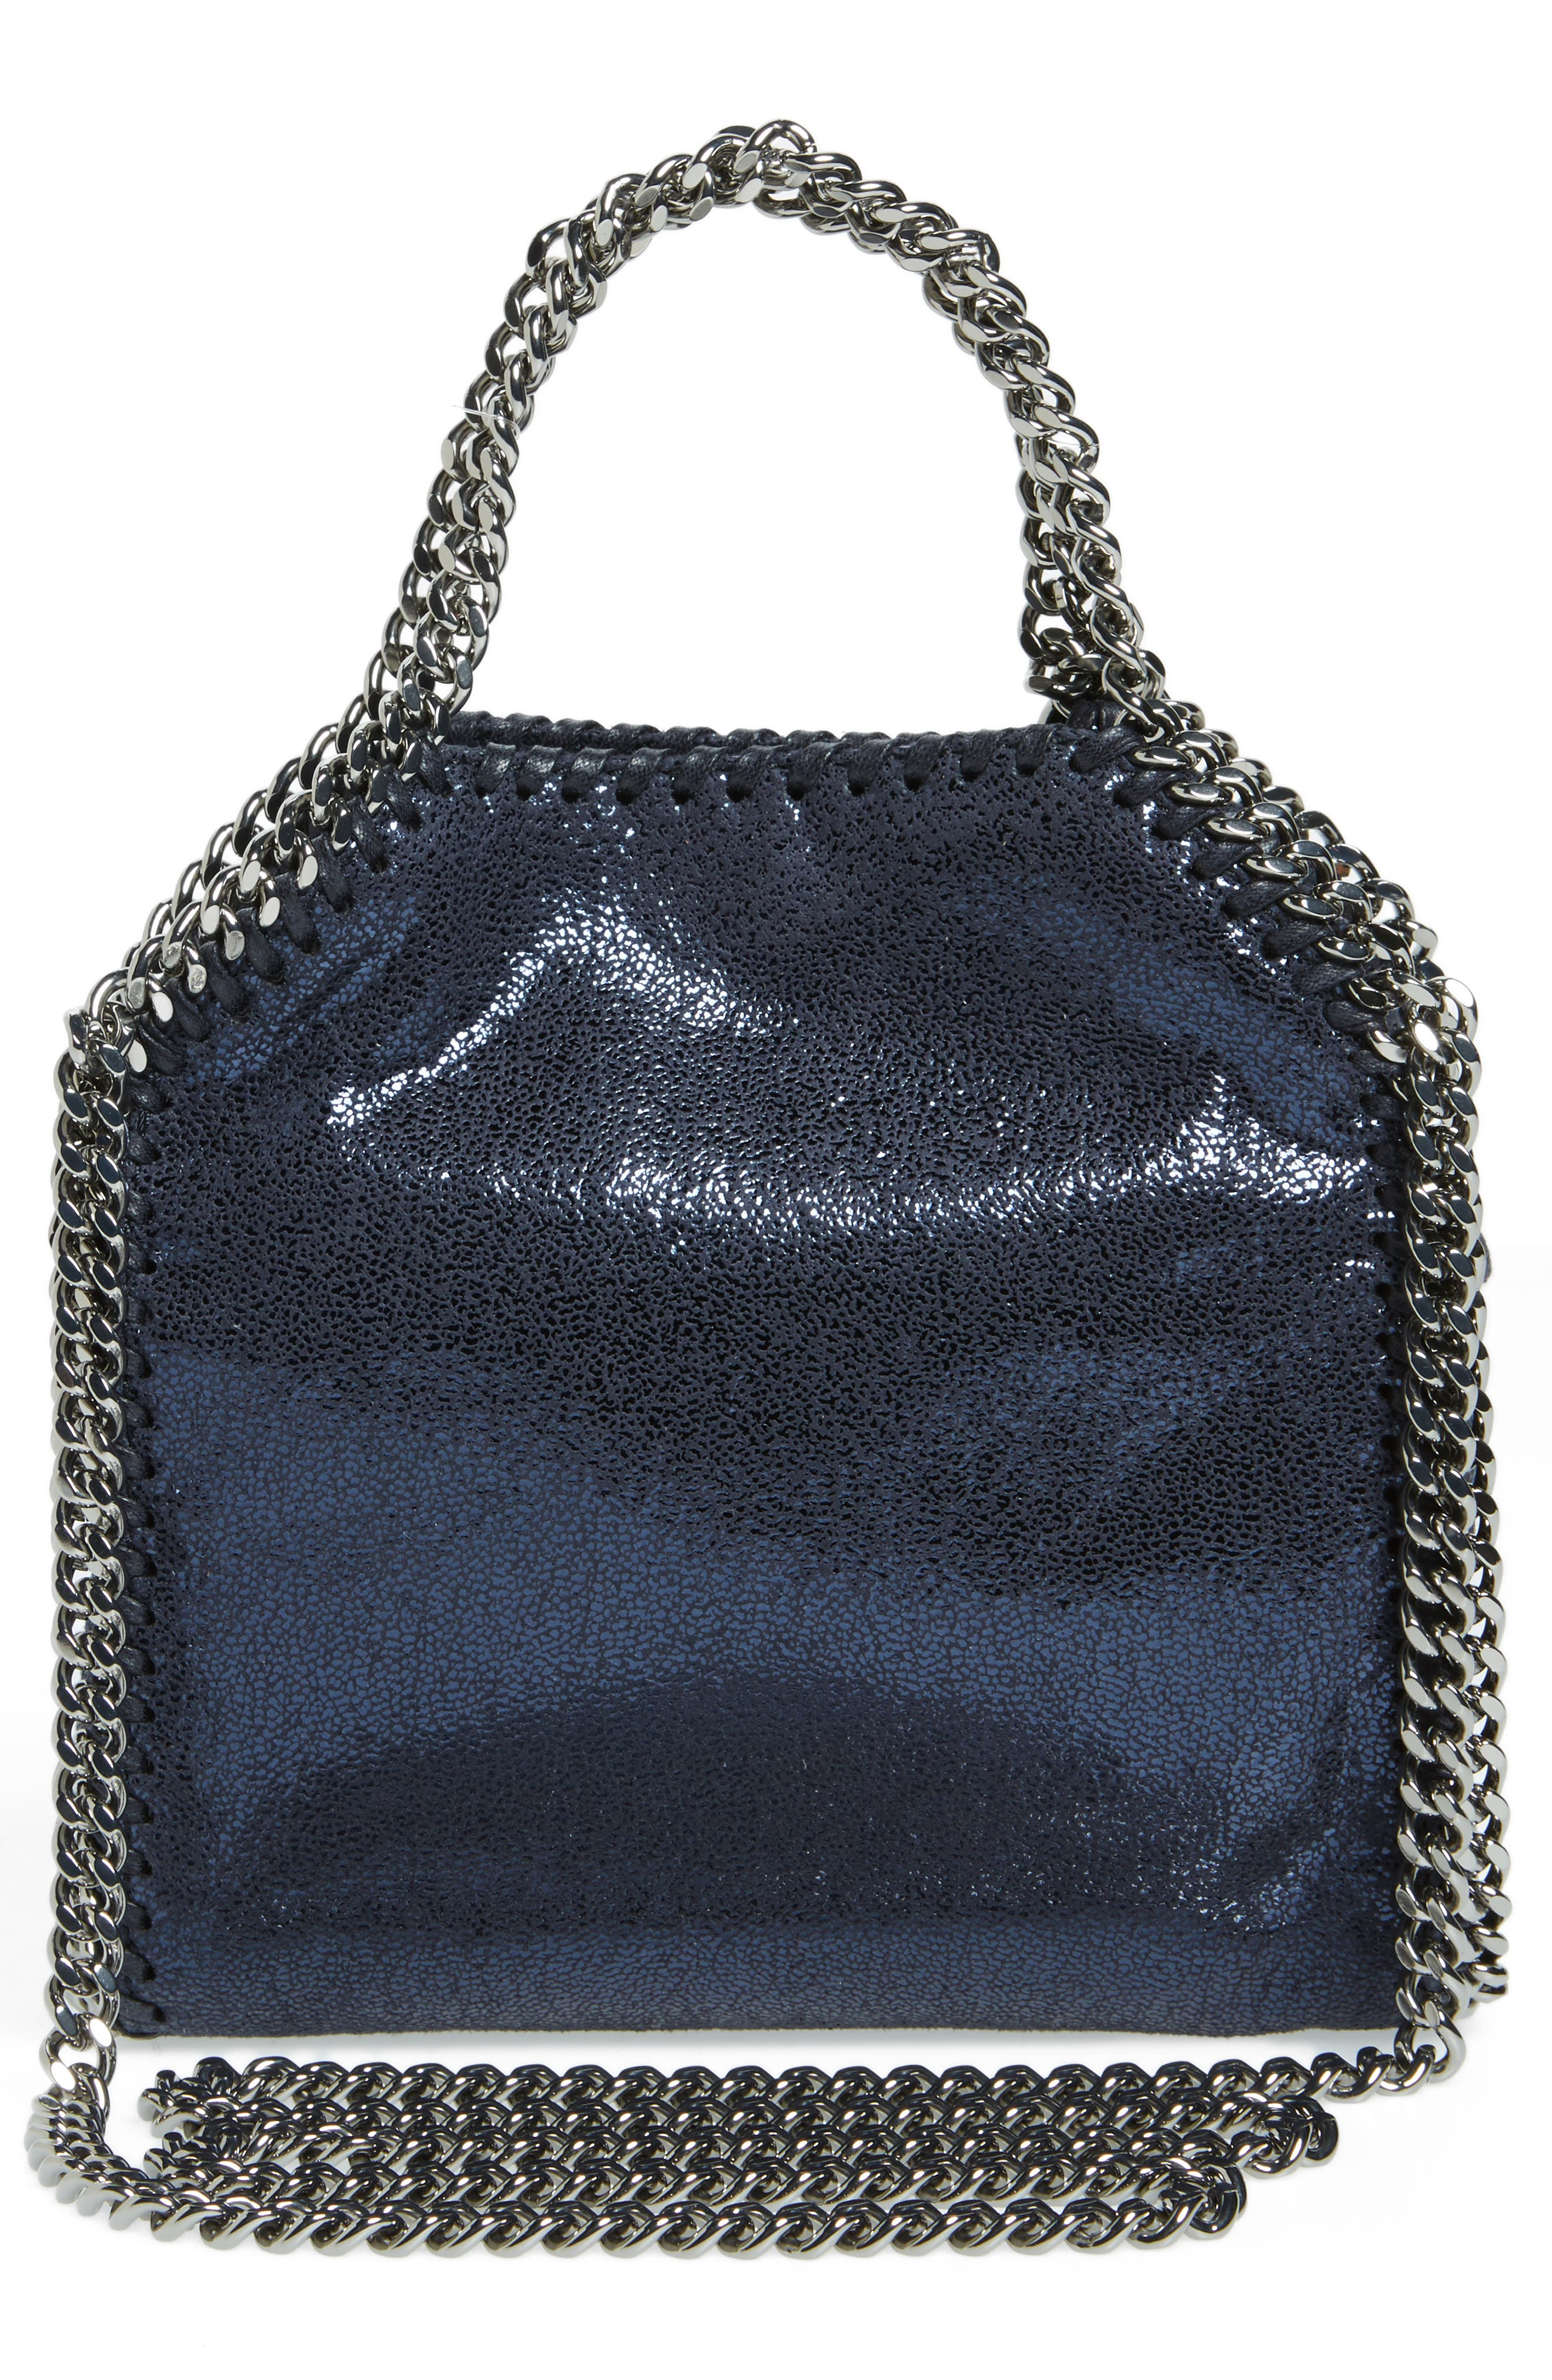 'Tiny Falabella' Metallic Faux Leather Crossbody Bag,                             Alternate thumbnail 2, color,                             Ink